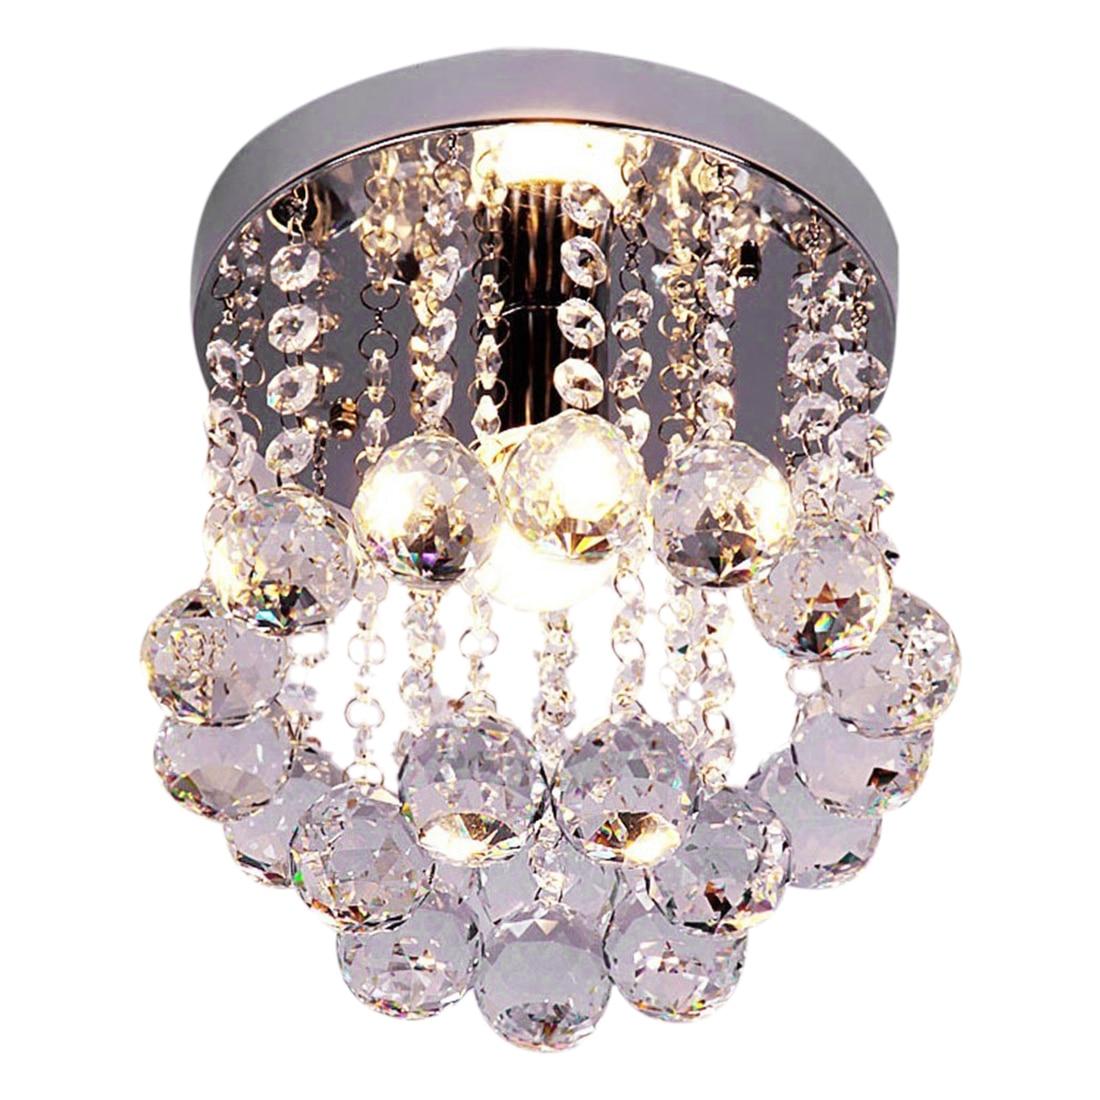 Retro Luxury Flush Mount Crystal Pendant   Chandelier Lighting HQ<br>